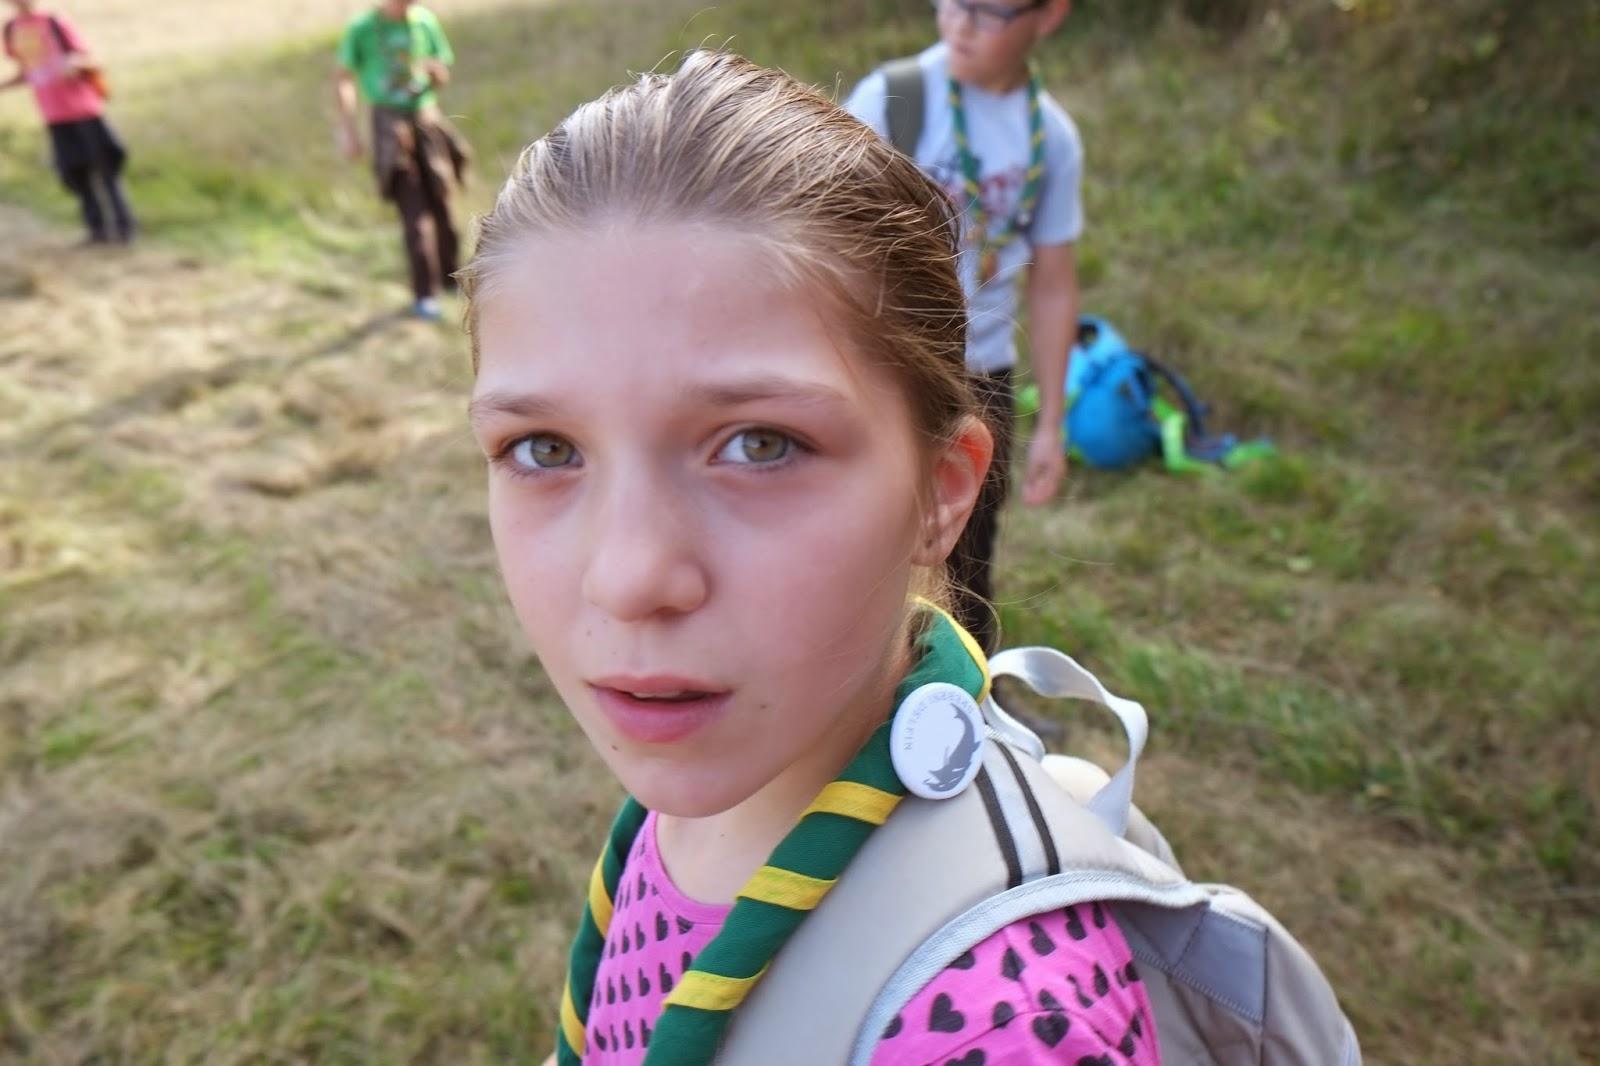 Pohod na Kozlek, Kozlek, 11.10.2014 - DSCF1152.JPG